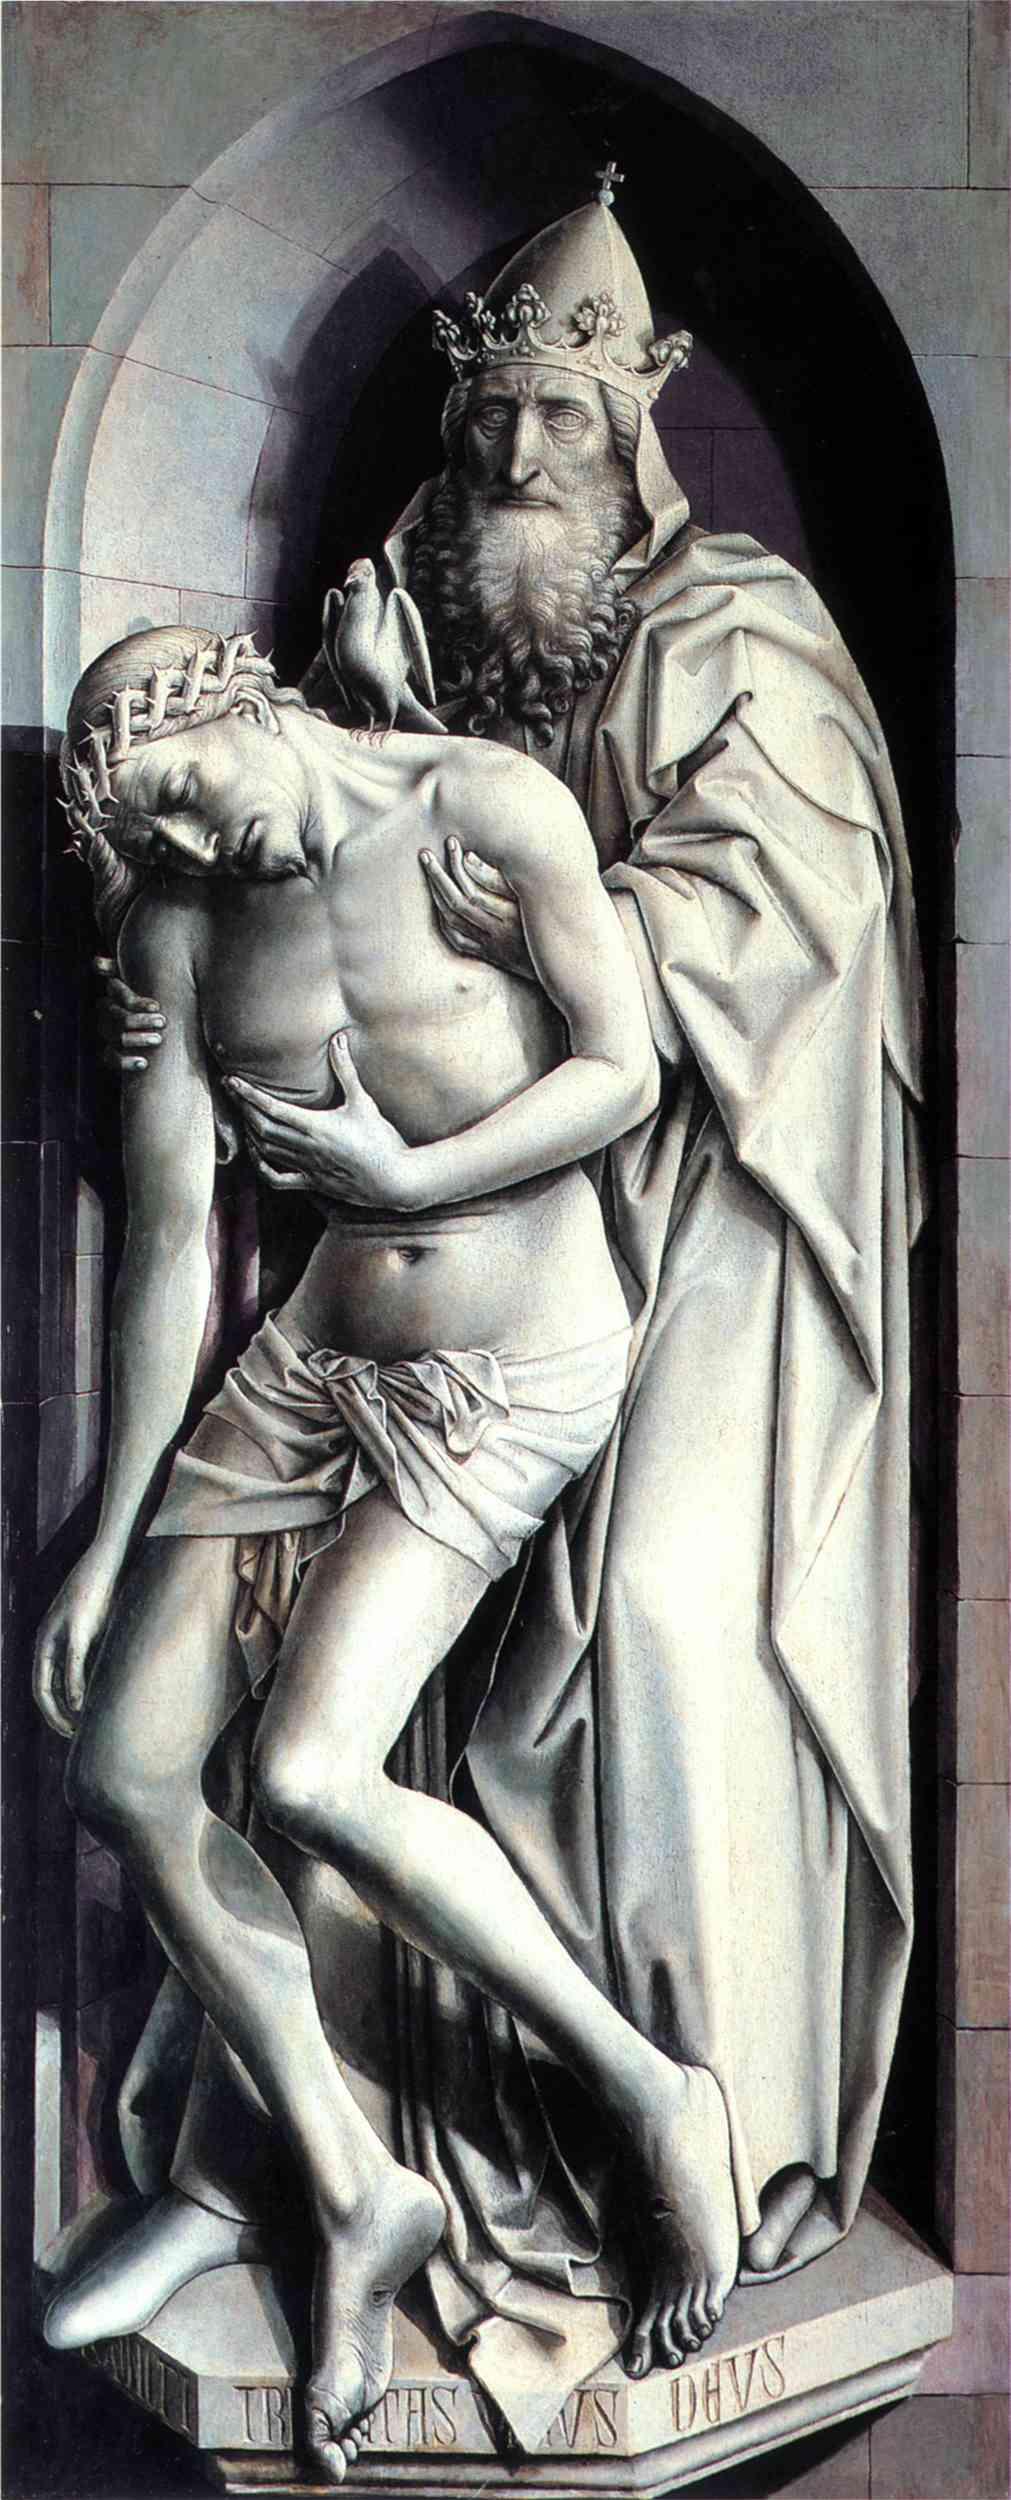 Les peintures religieuses de Robert Campin Trinit10